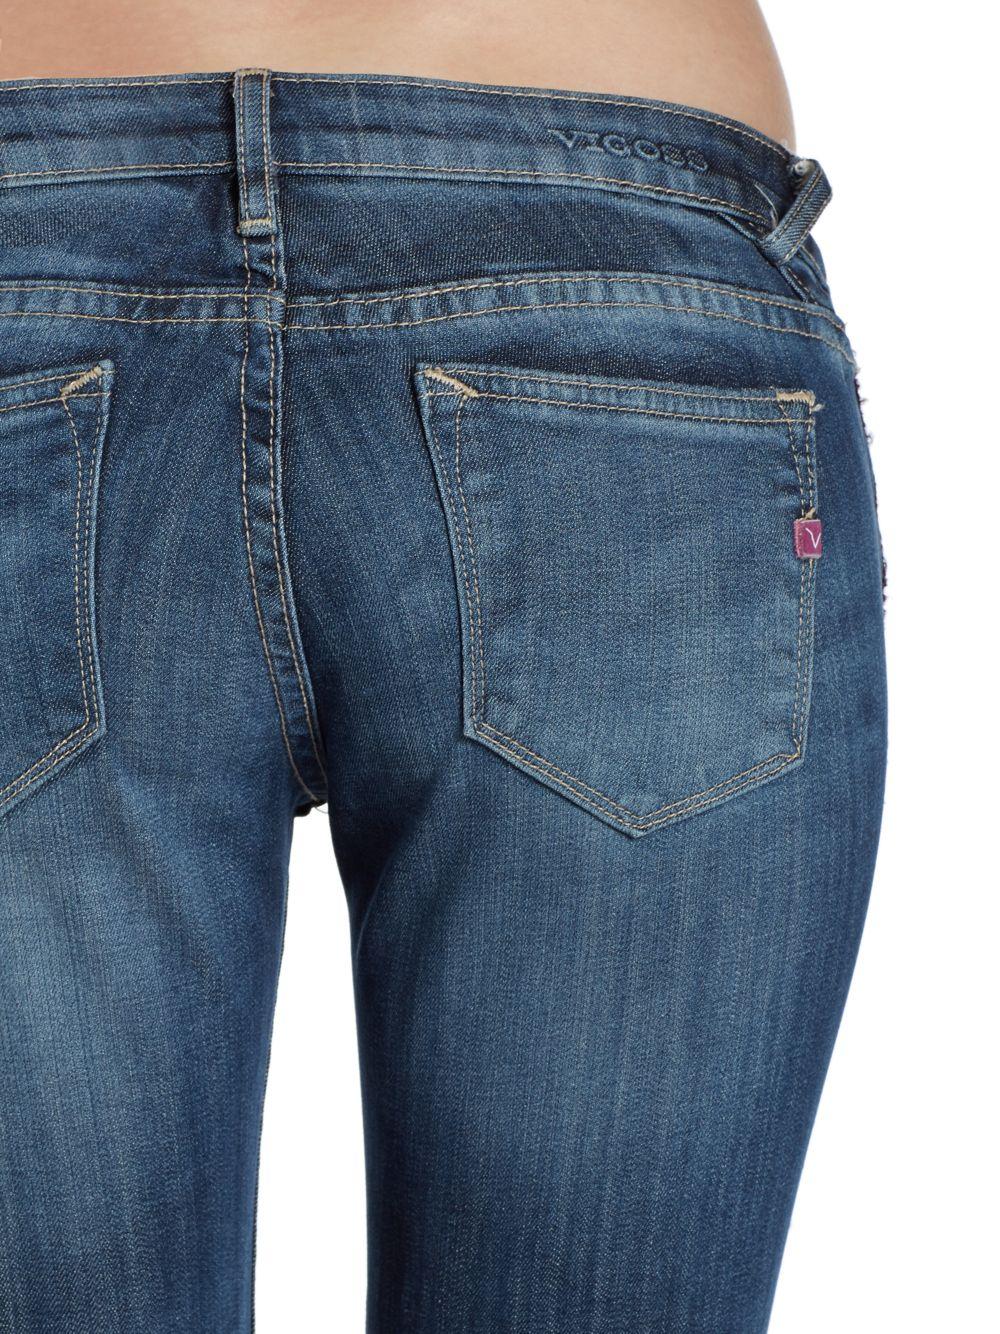 d758f7e074a Lyst - Vigoss Jagger Skinny Jeans in Blue